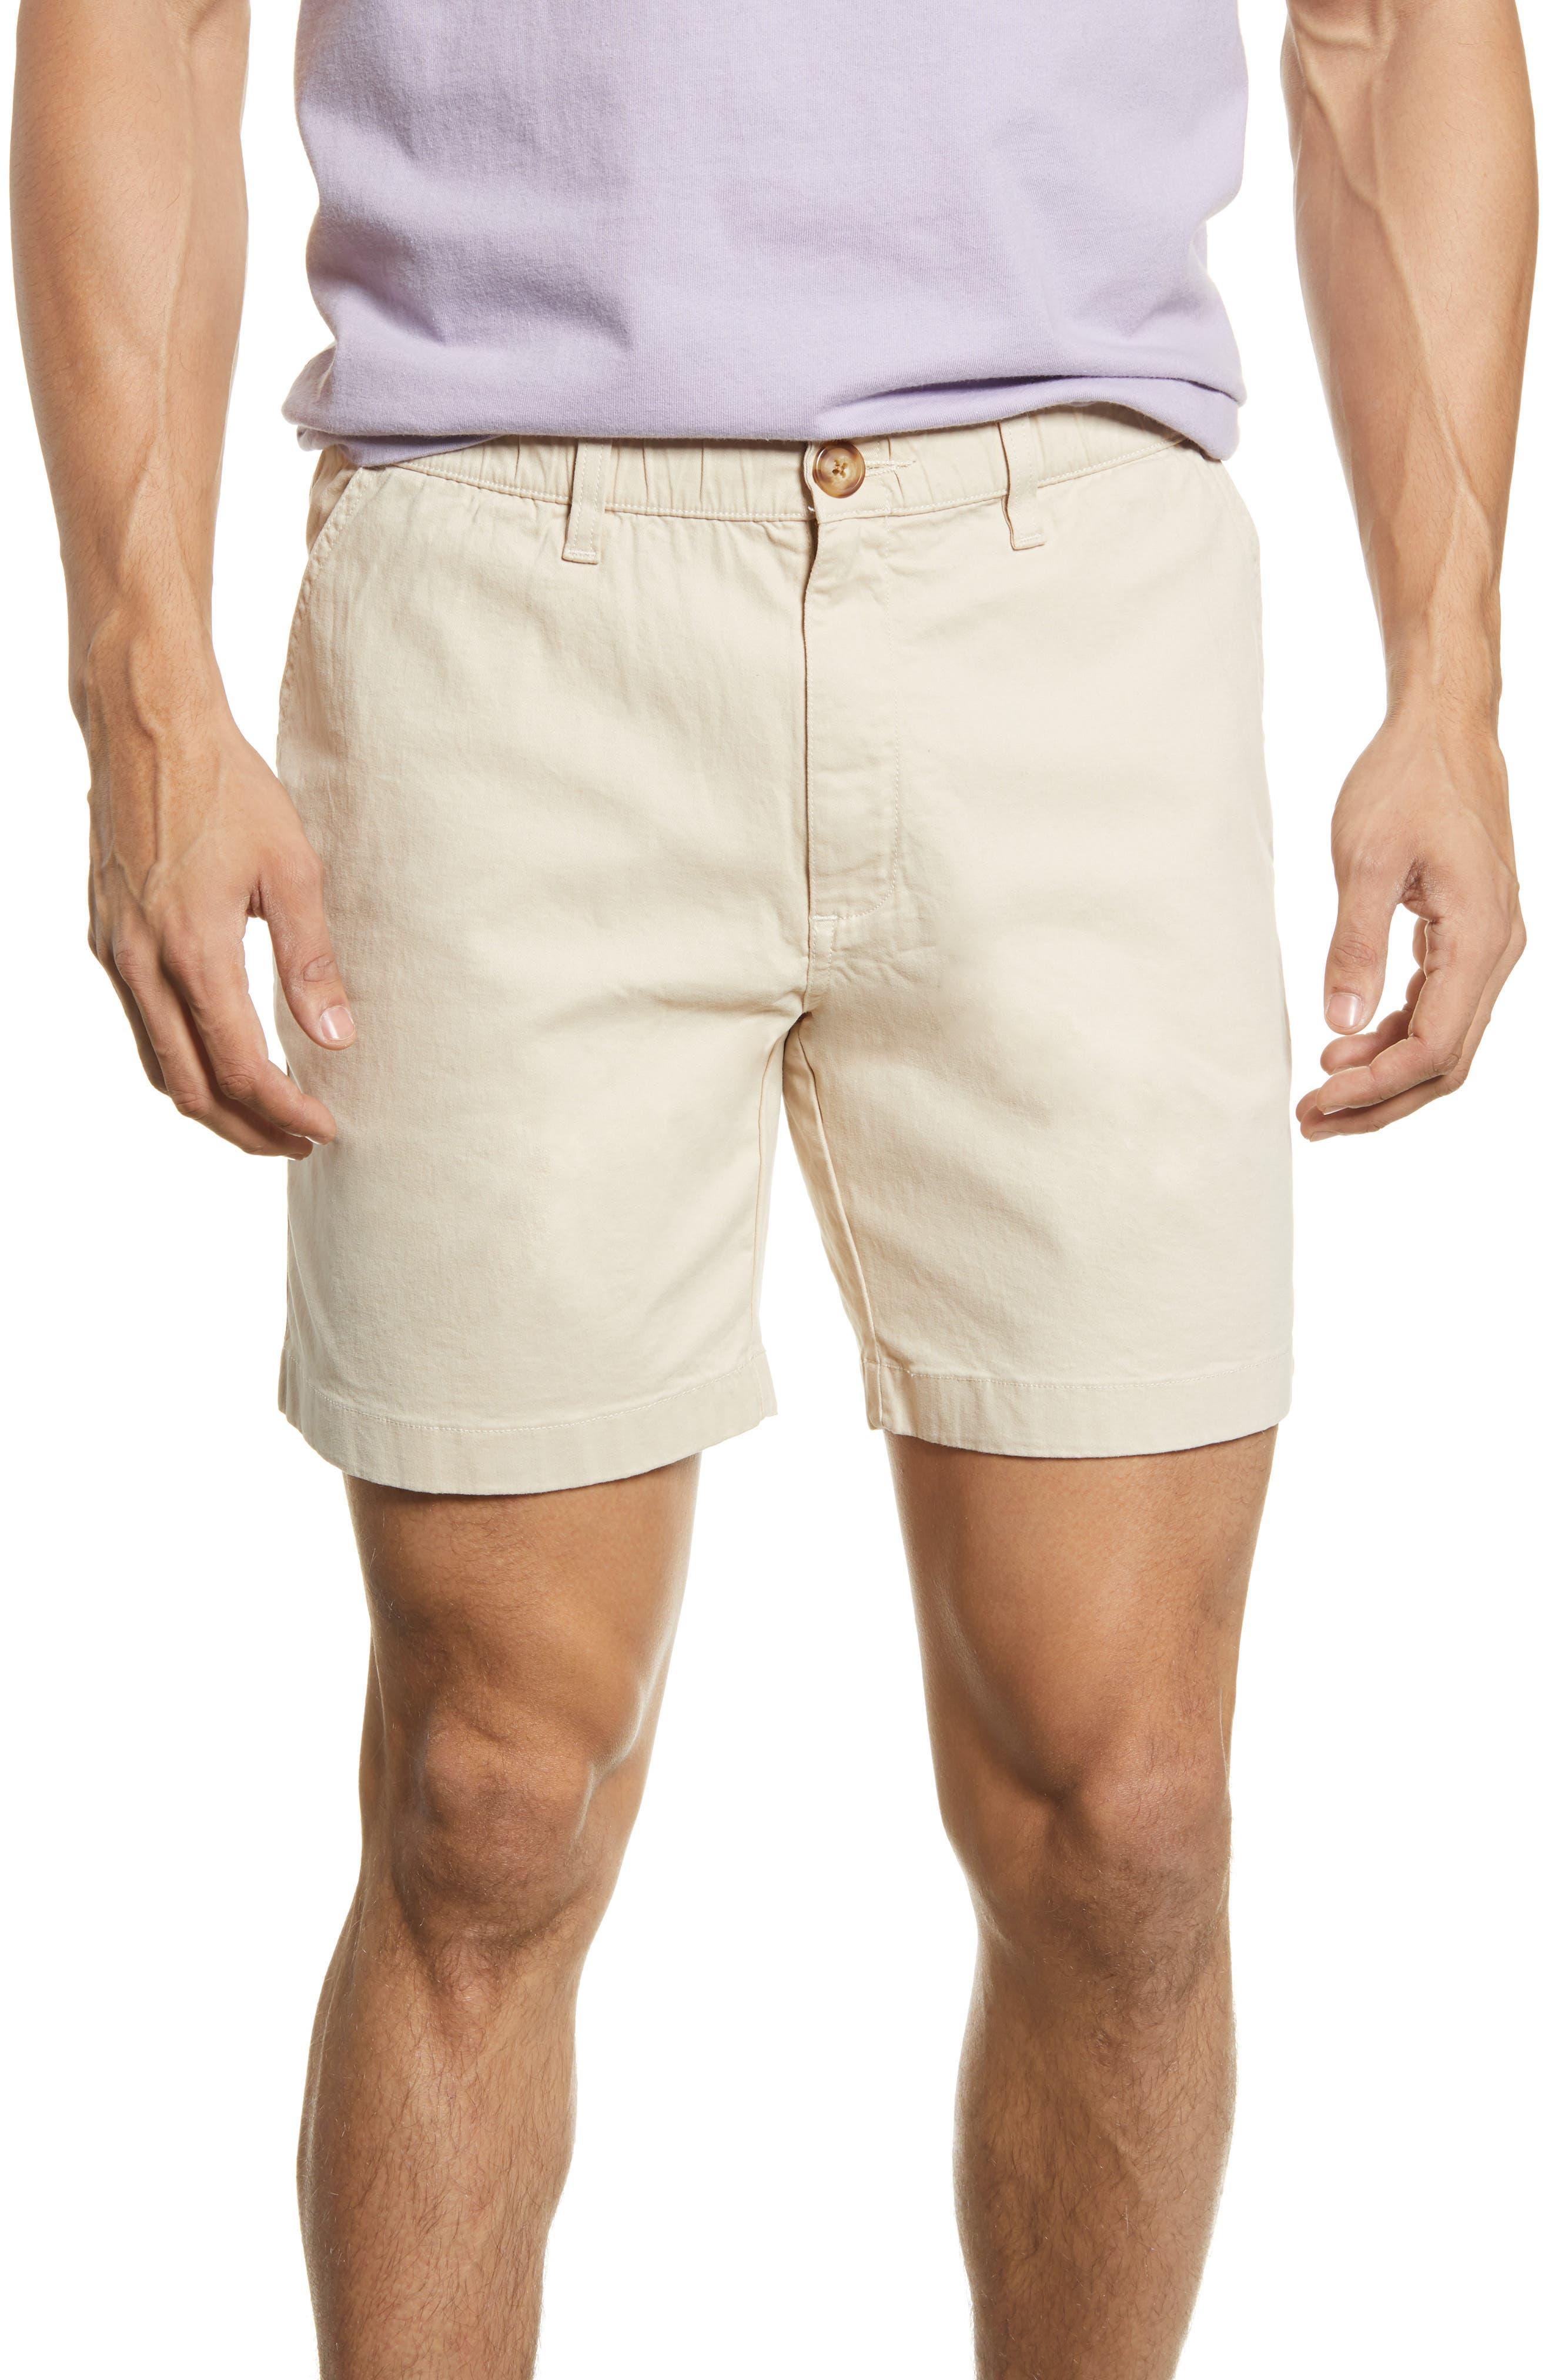 The Khakinators Shorts